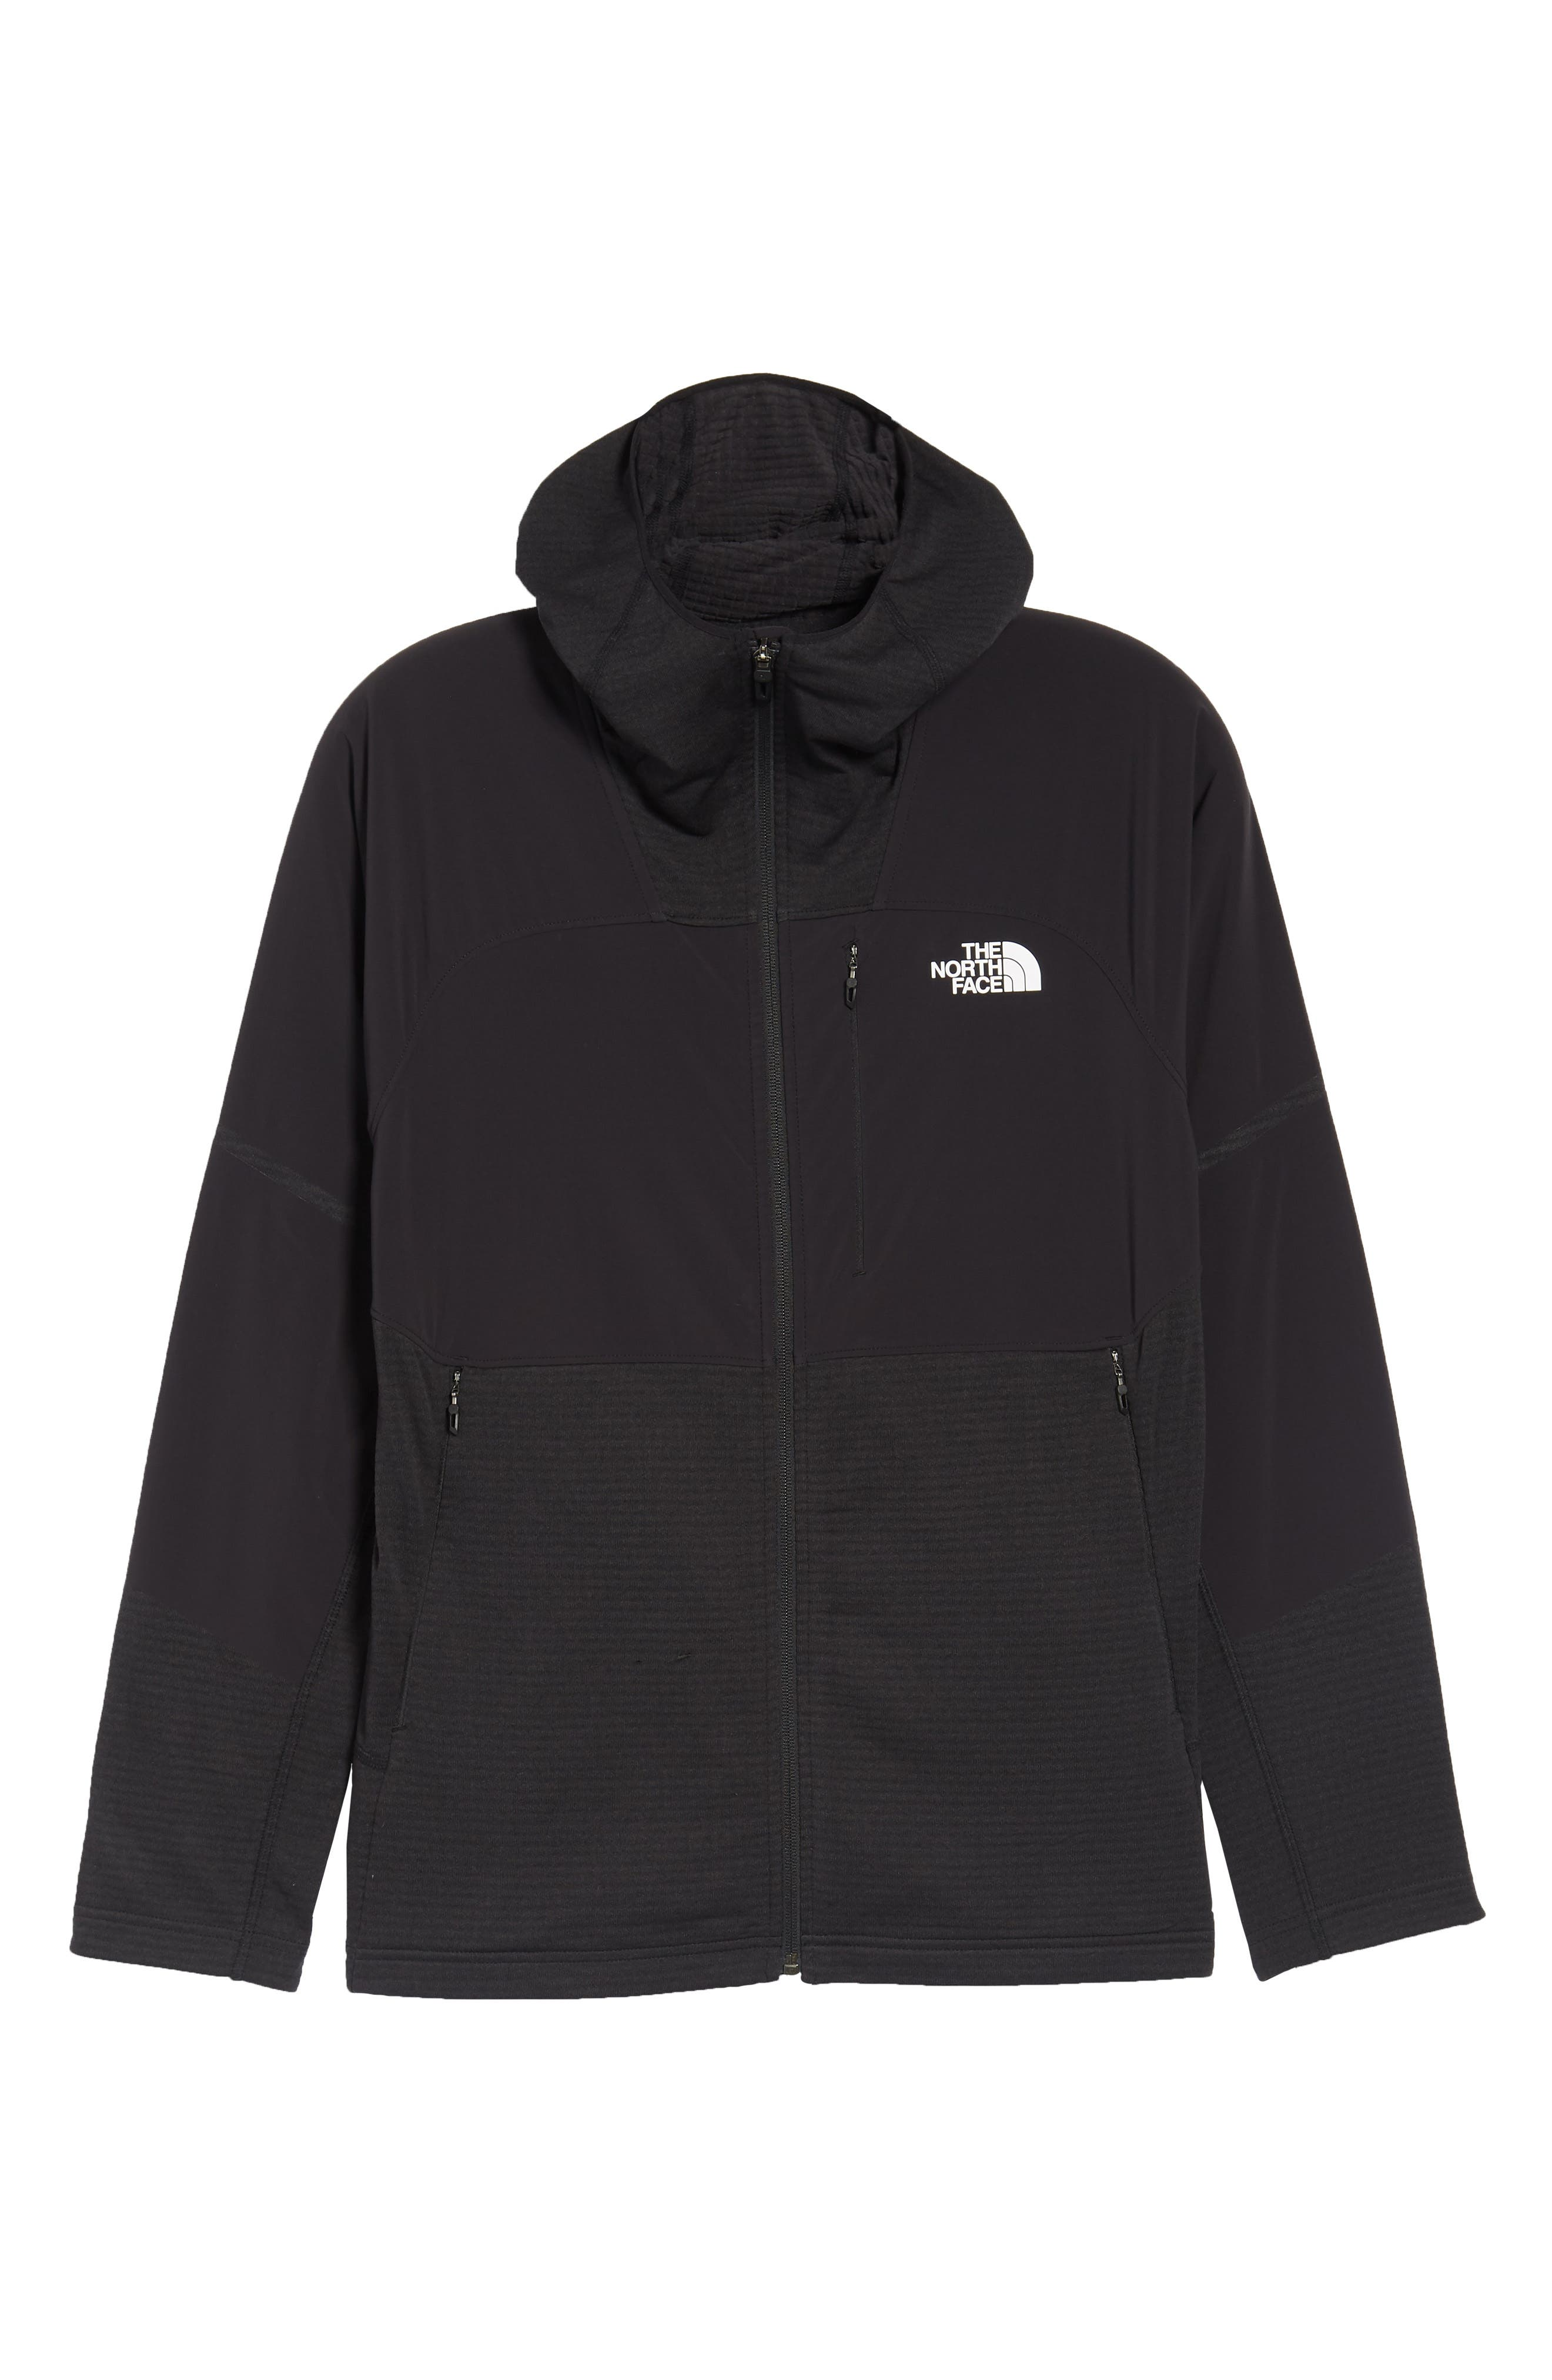 Progressor Power Grid<sup>™</sup> Hooded Fleece Jacket,                             Alternate thumbnail 6, color,                             Black/ Black